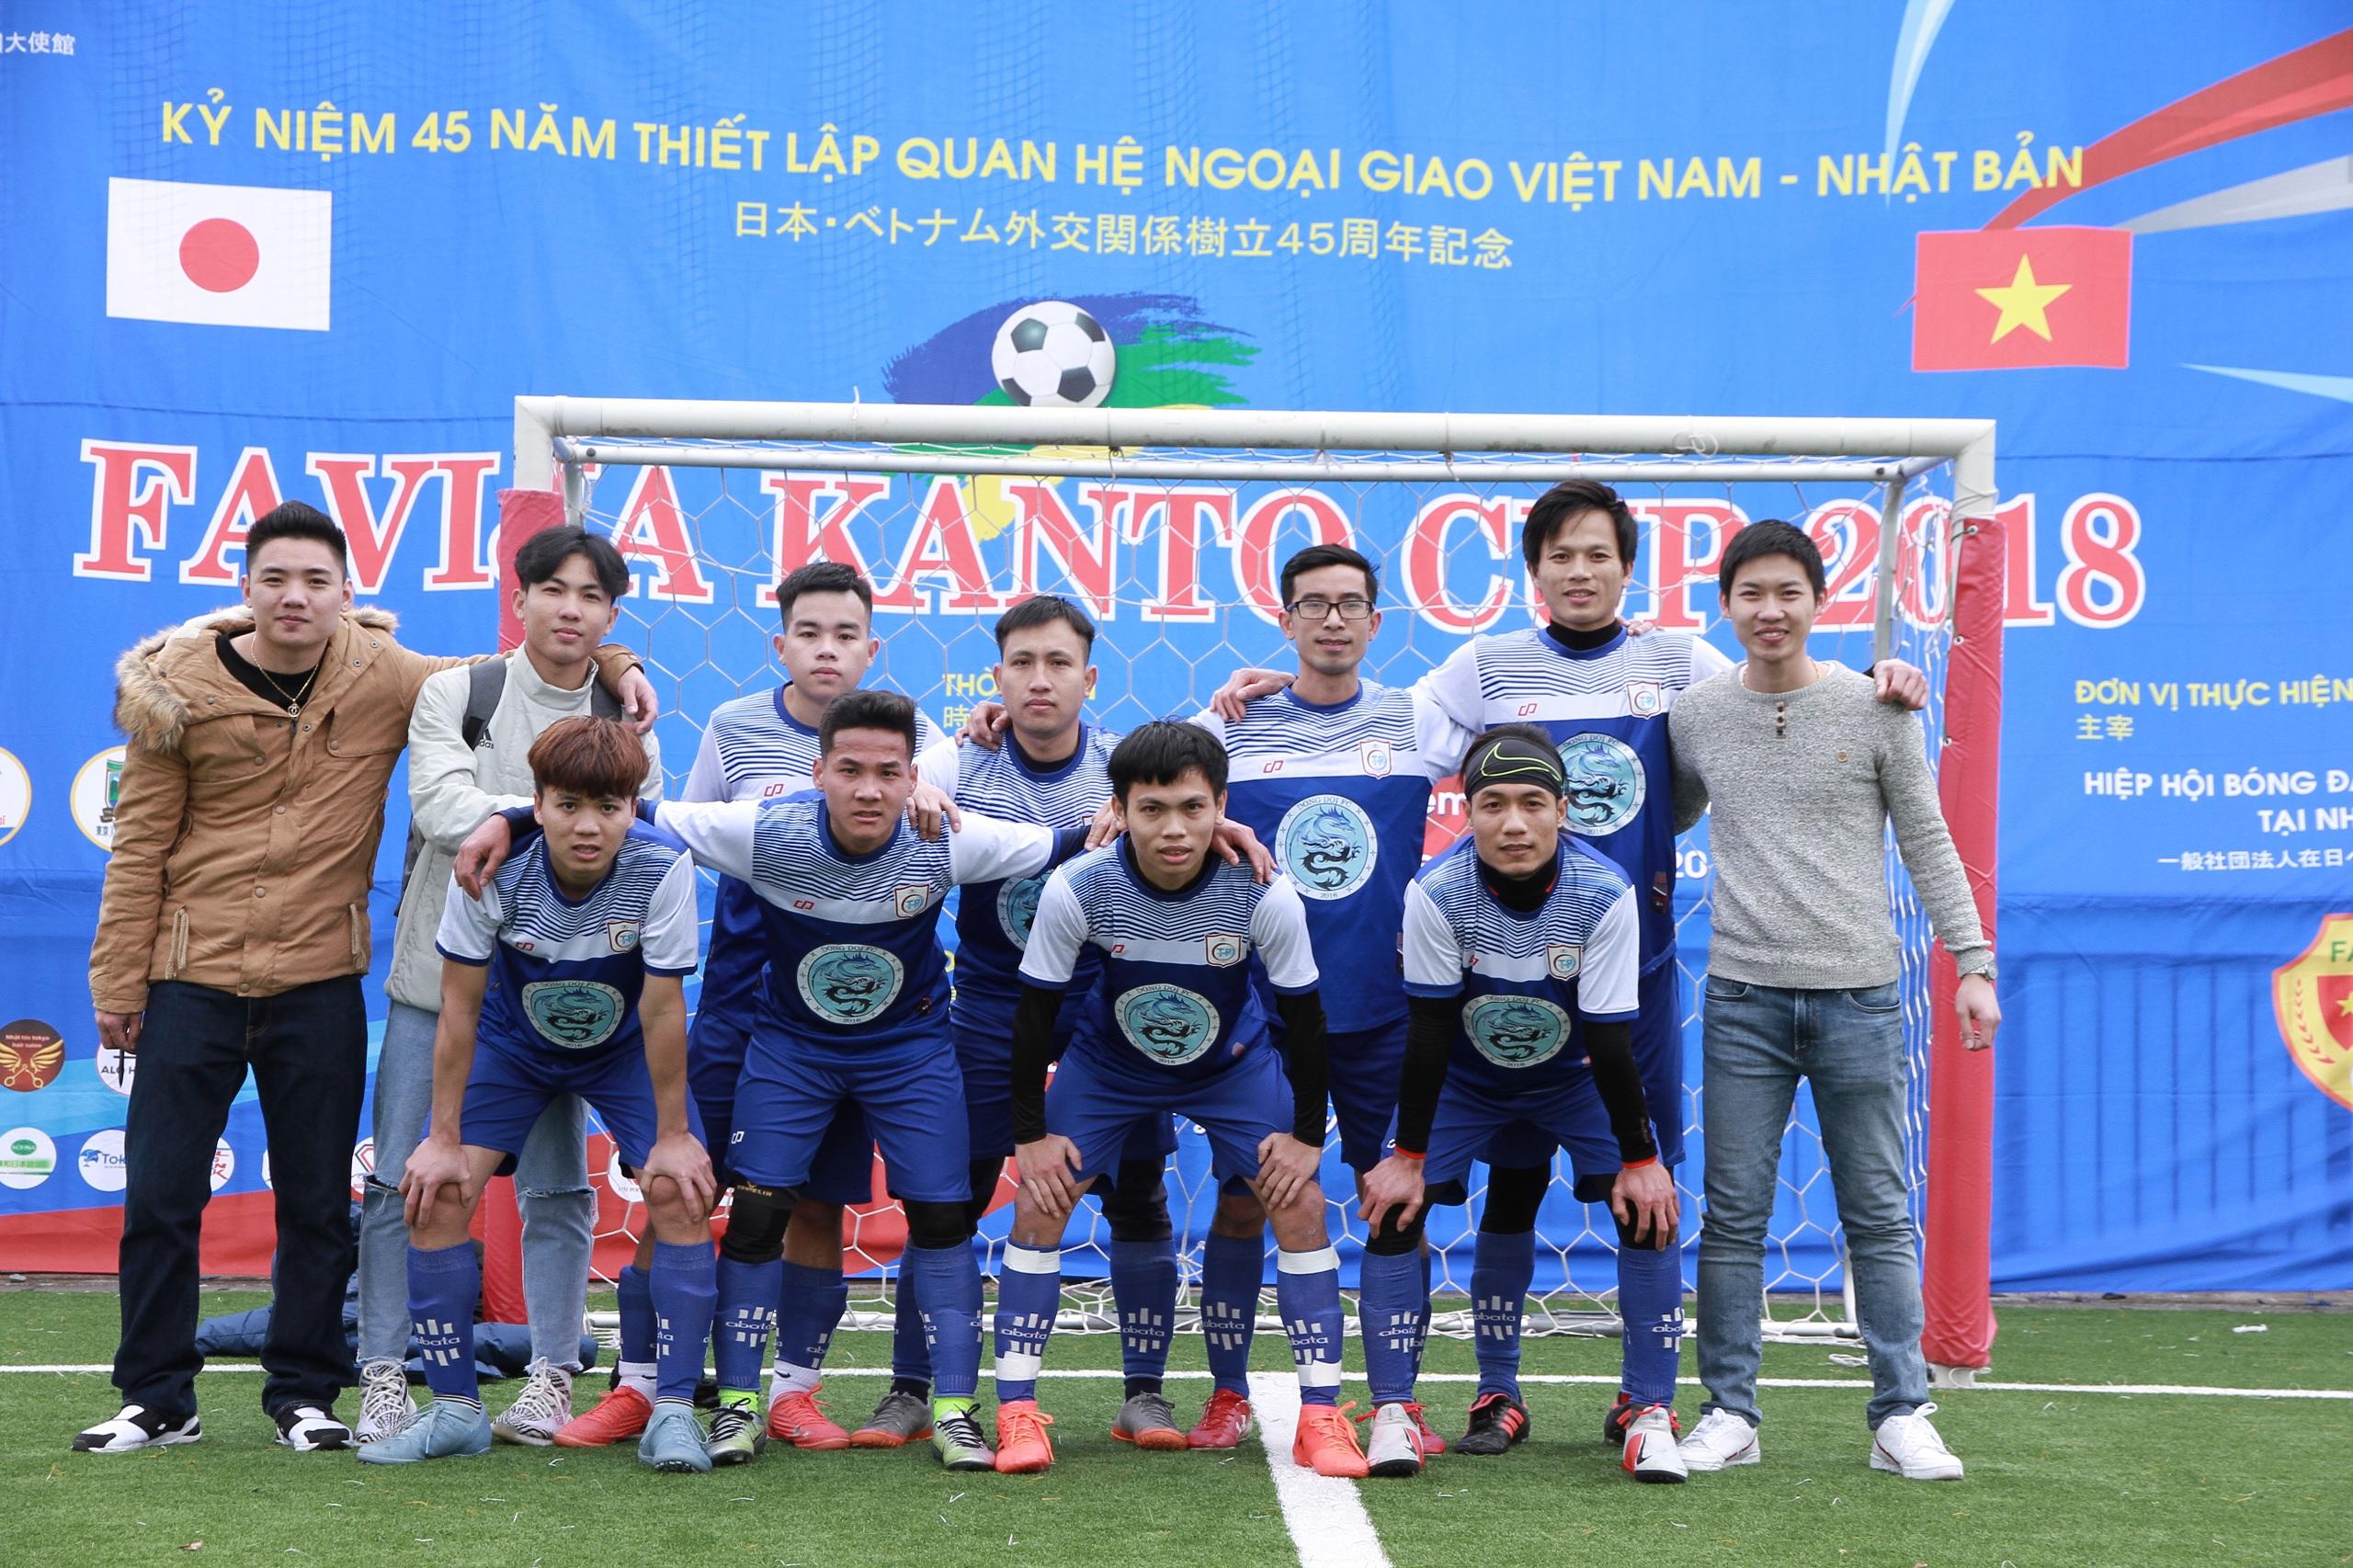 GIẢI BÓNG ĐÁ FAVIJA KANTO CUP 2018.